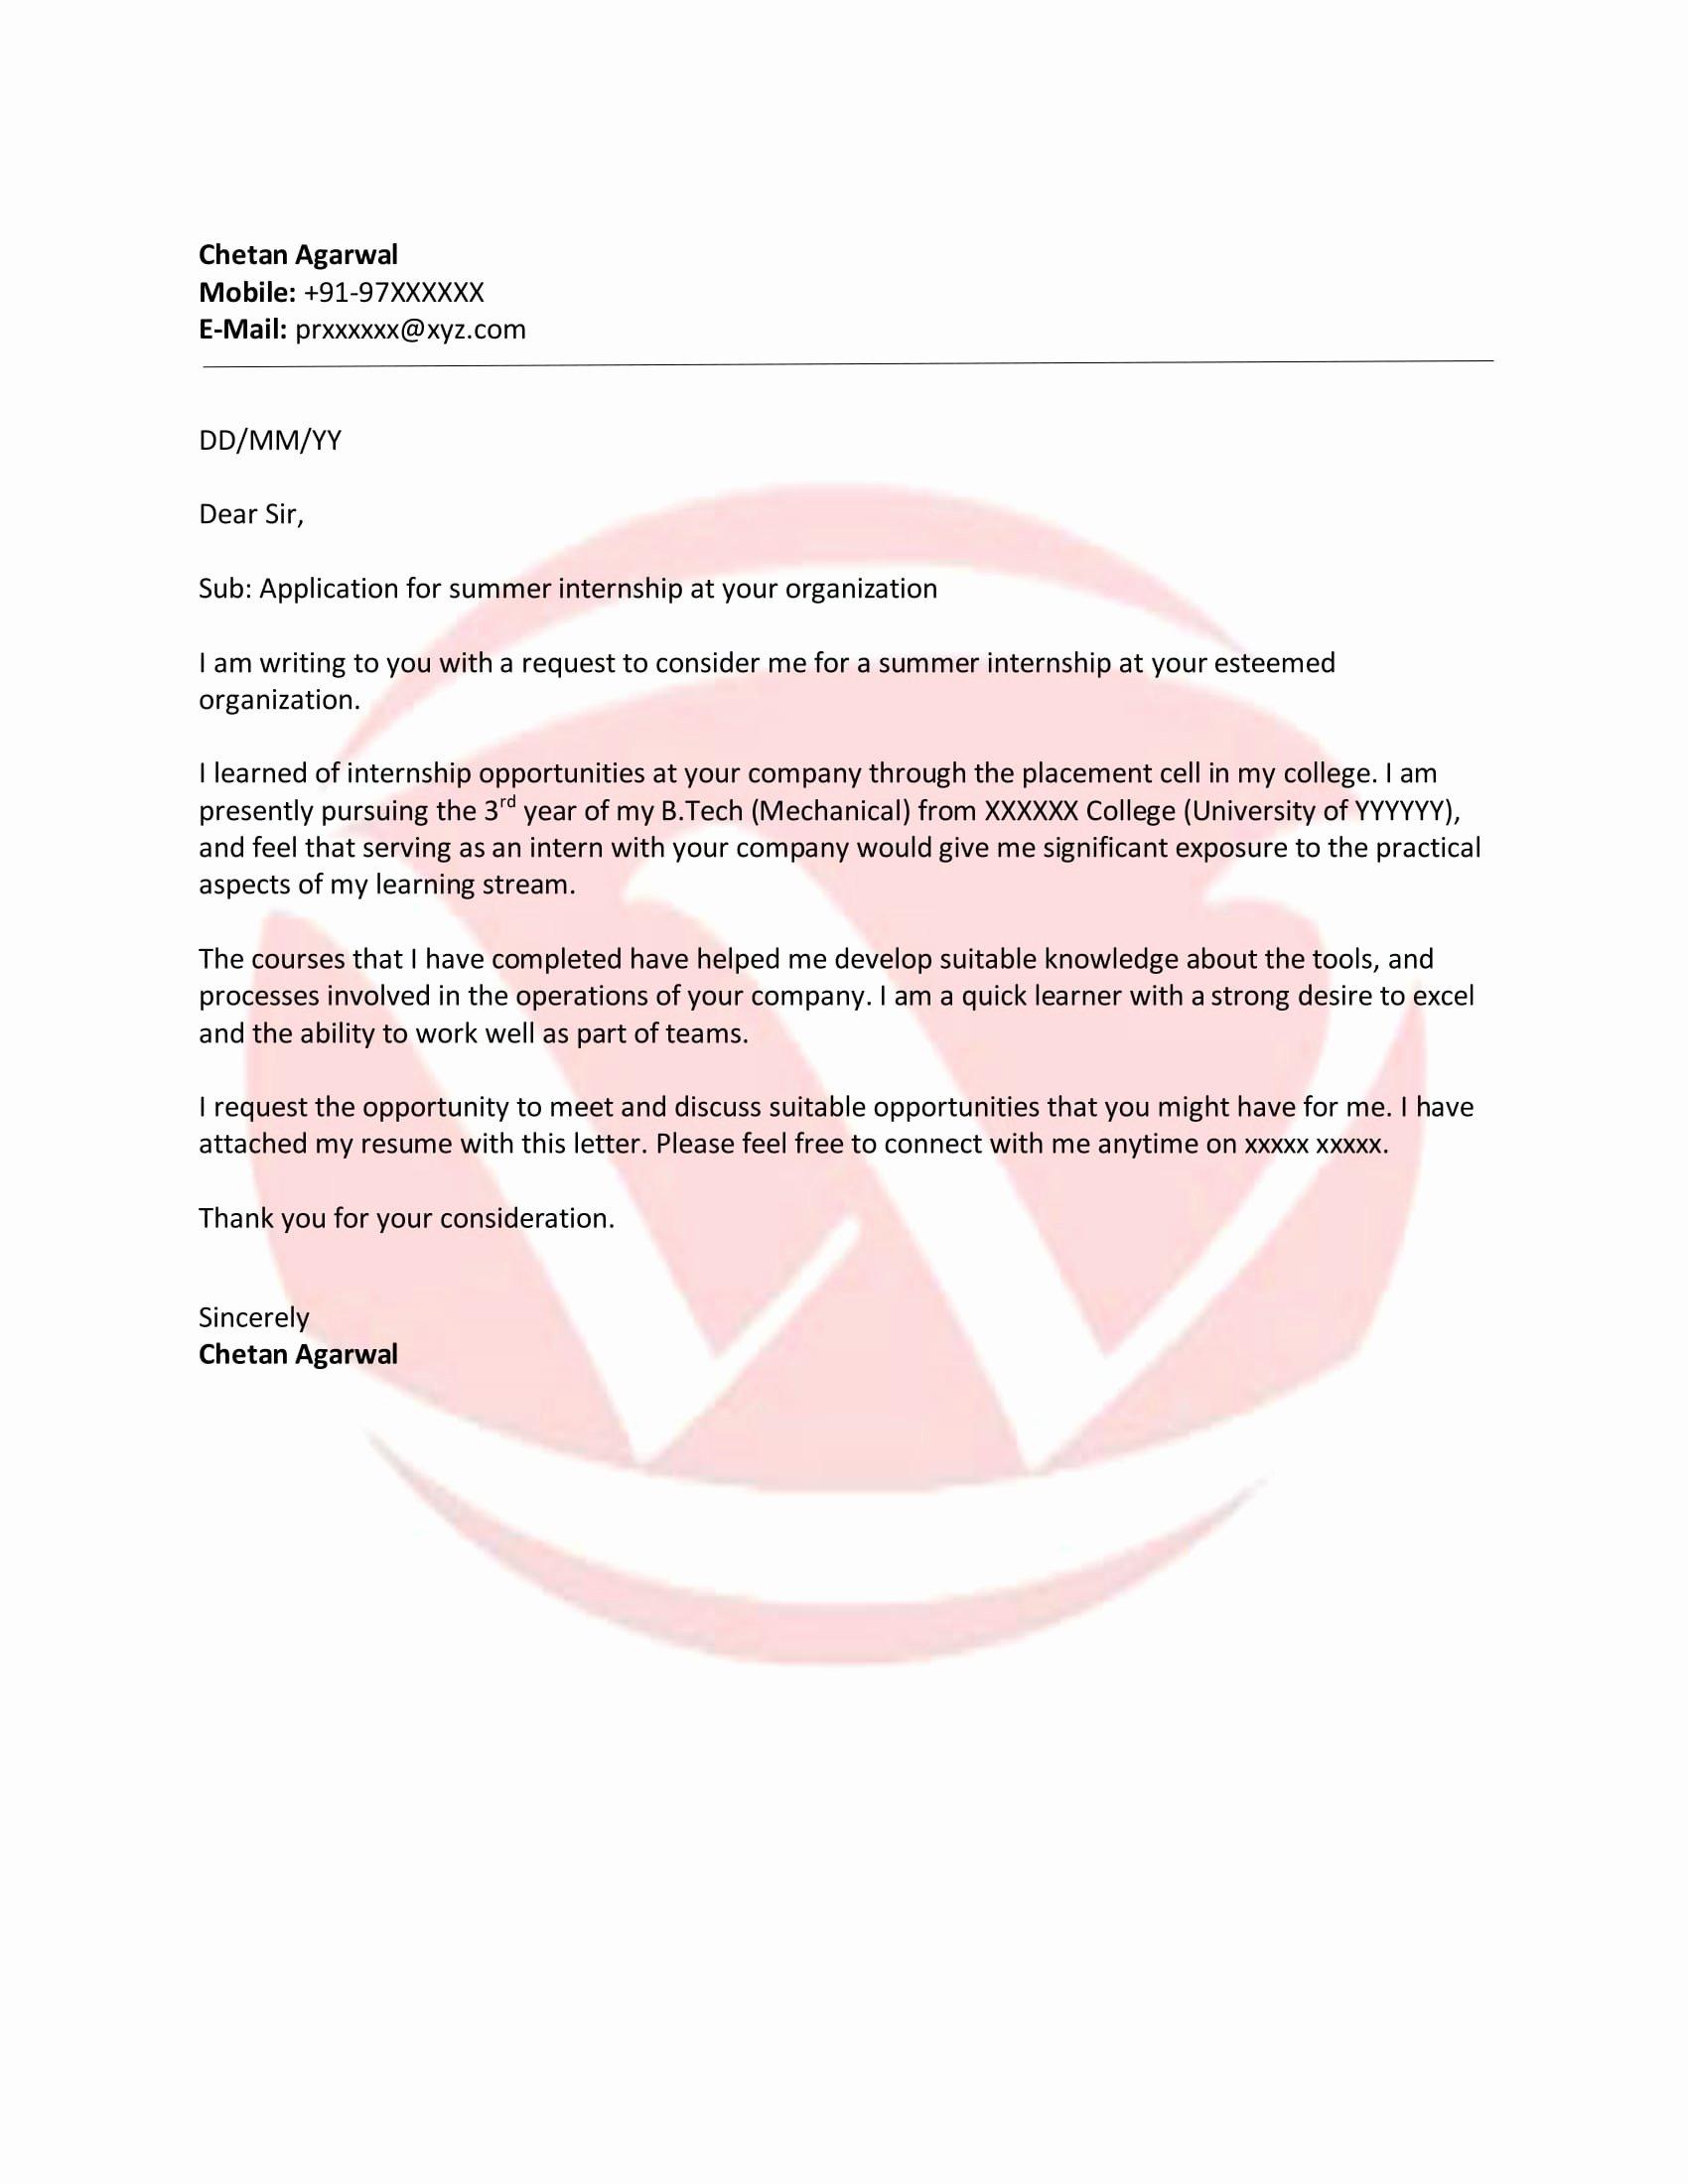 Internship Letter format Students Best Of Internship Sample Letter format Download Letter format